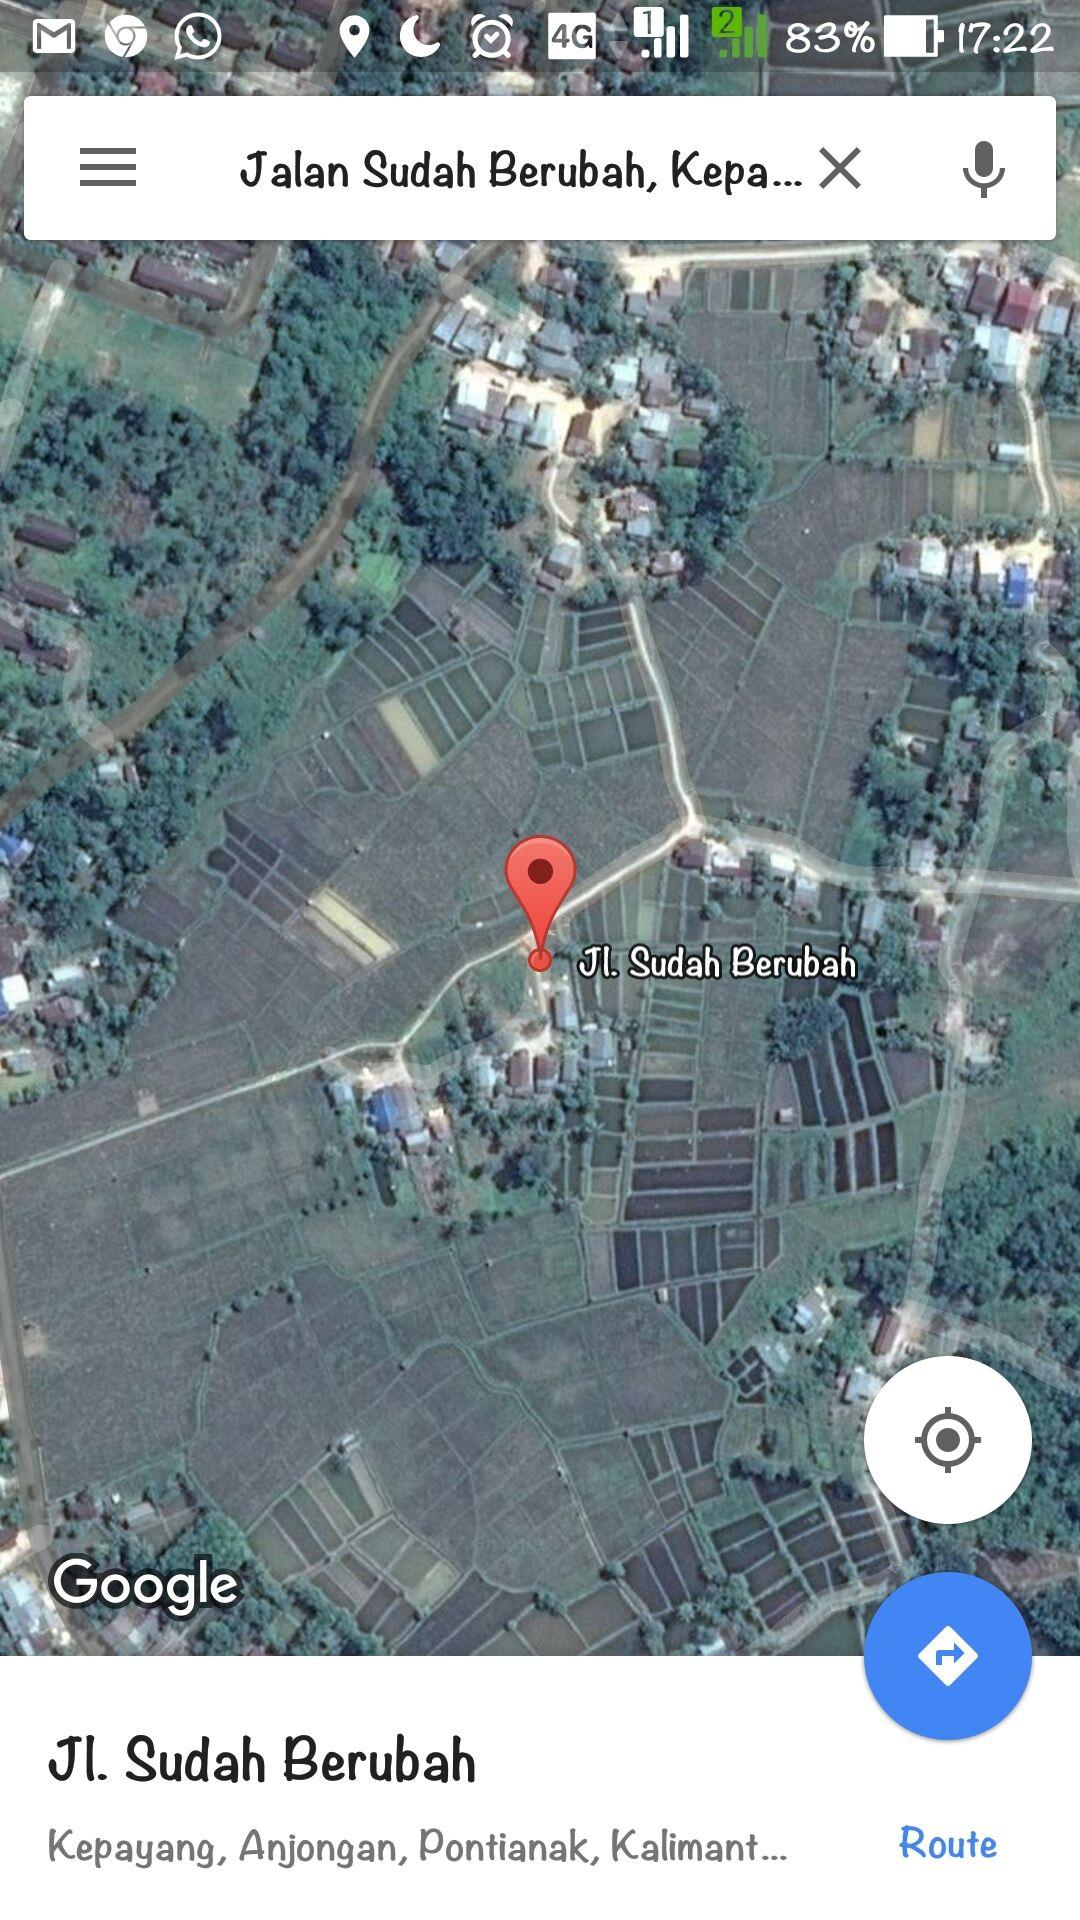 Nama Jalan Aneh Di Google Maps 2